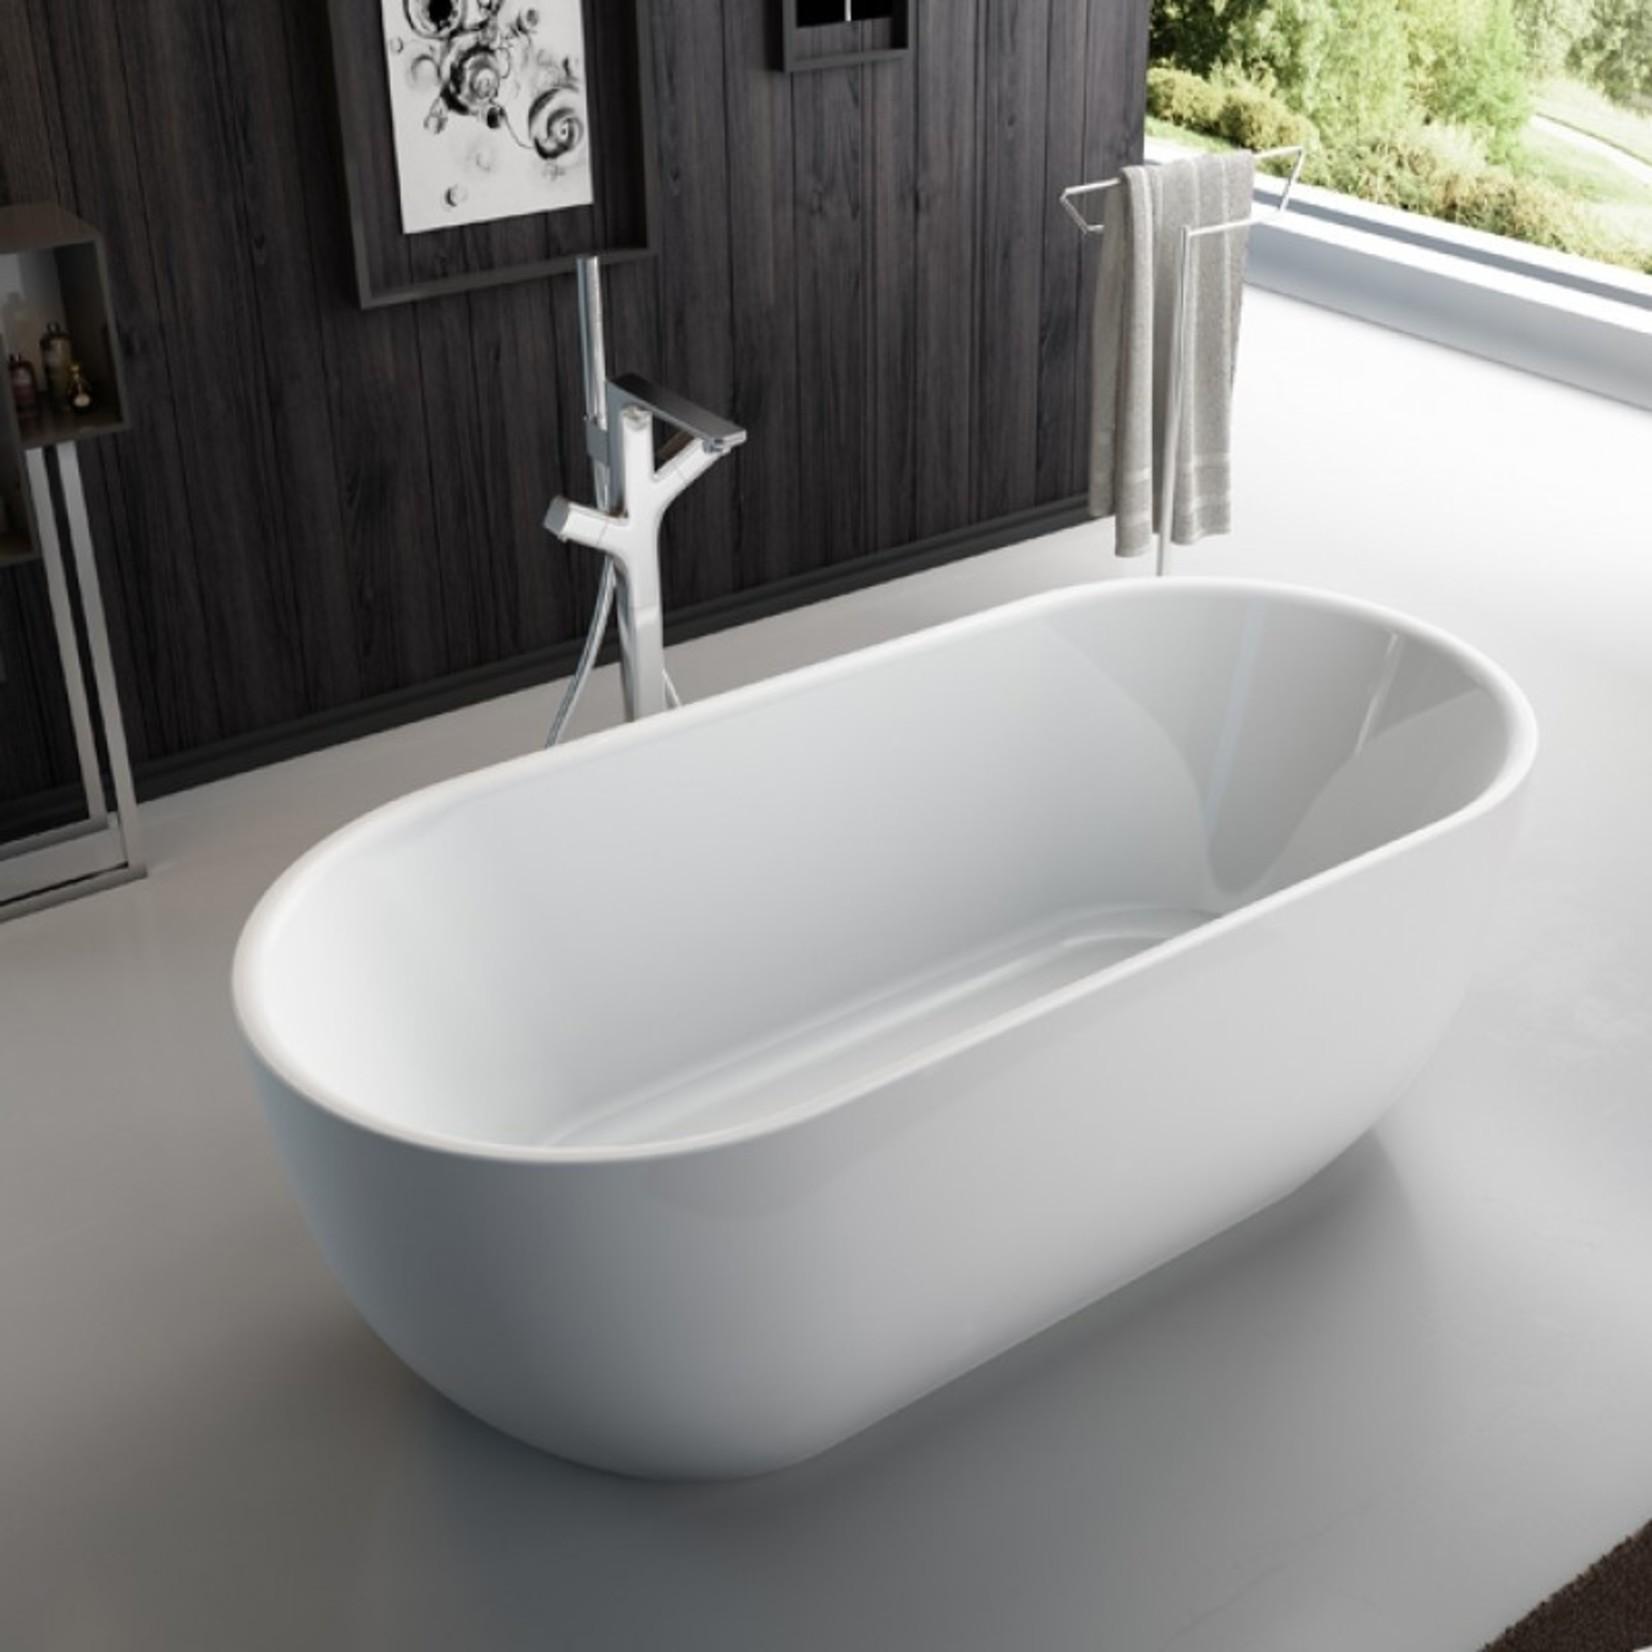 Lily 67 '' Luxury Freestanding Bathtub